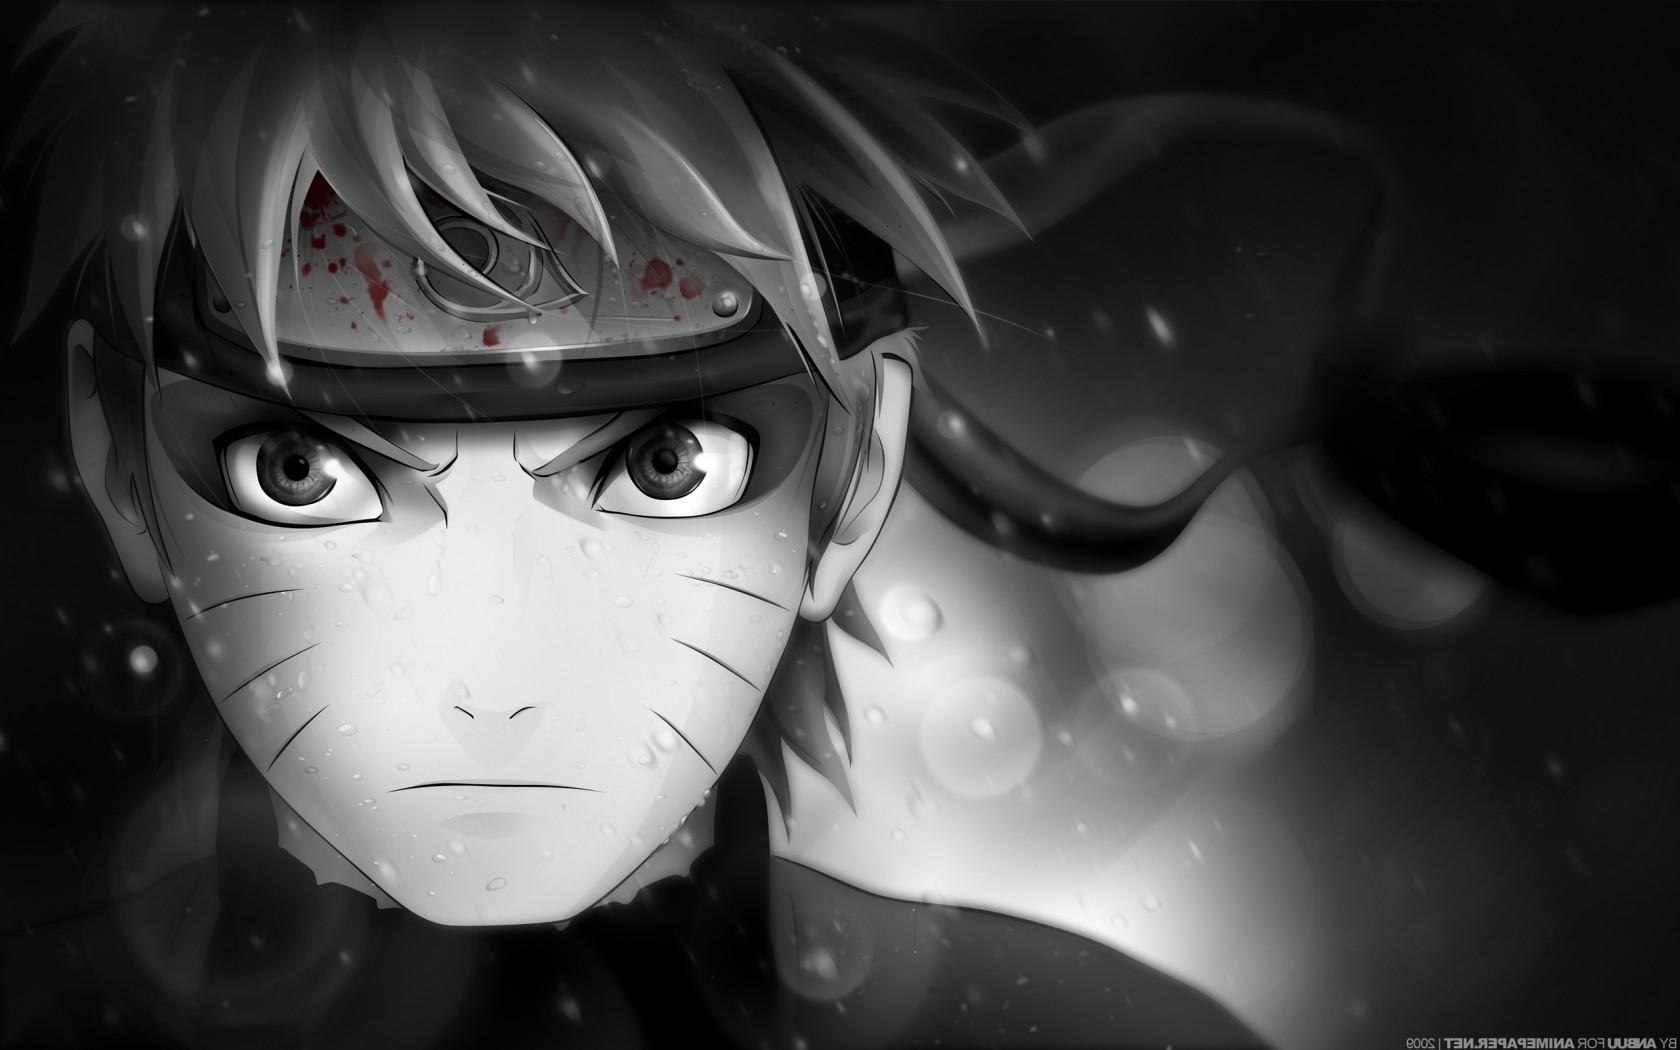 Beautiful Wallpaper Naruto Gambar - black-monochrome-anime-Naruto-Shippuuden-Uzumaki-Naruto-darkness-screenshot-1680x1050-px-computer-wallpaper-black-and-white-monochrome-photography-617222  Pictures_42398.jpg